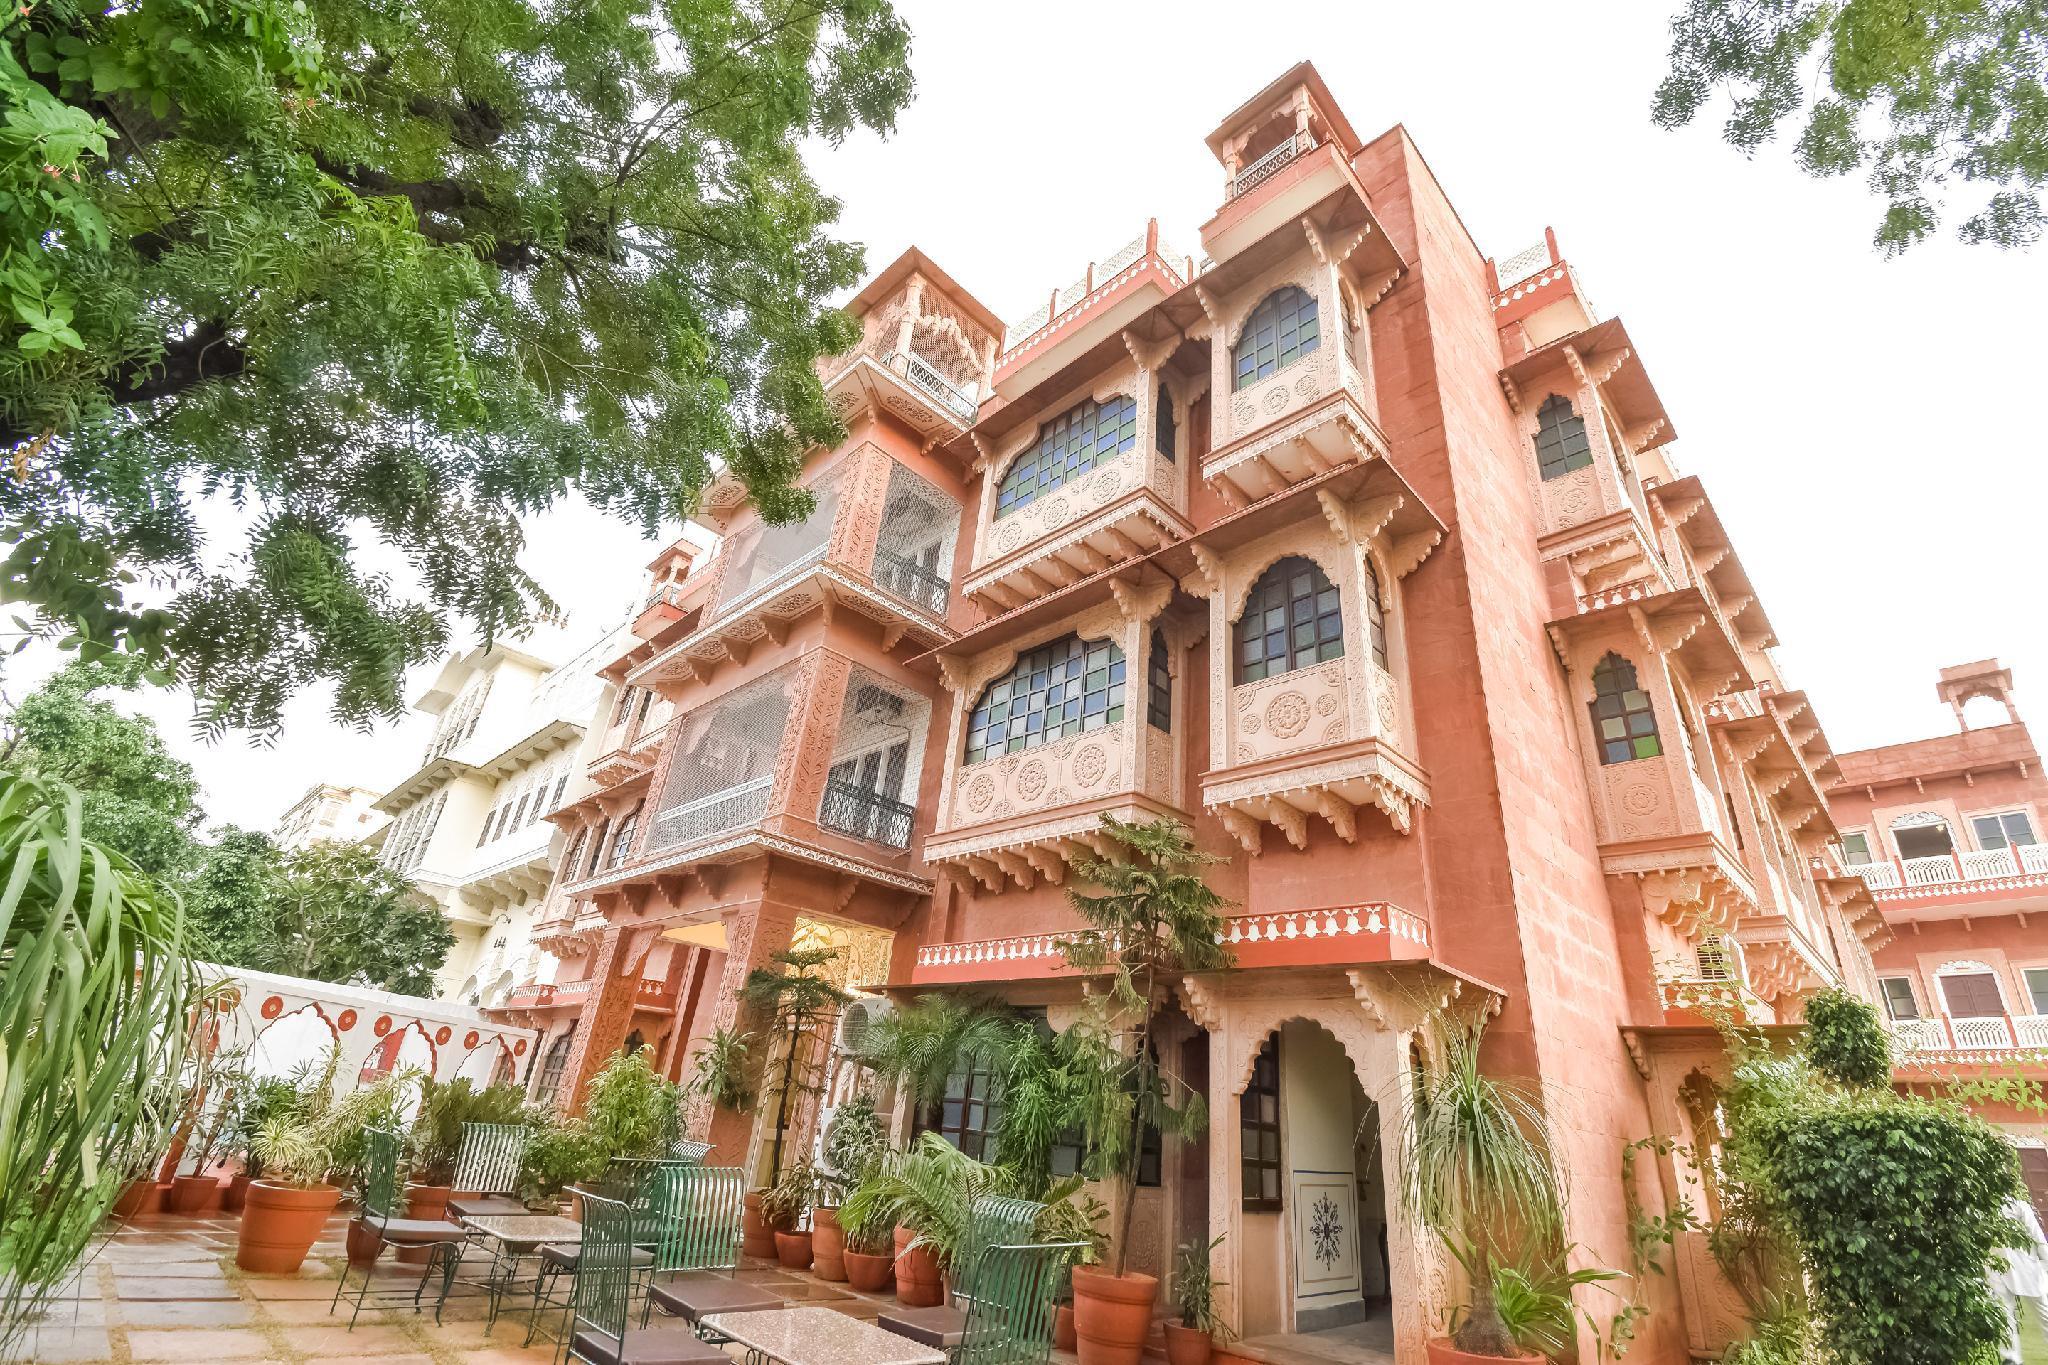 Mahal Khandela A Heritage Hotel And Spa